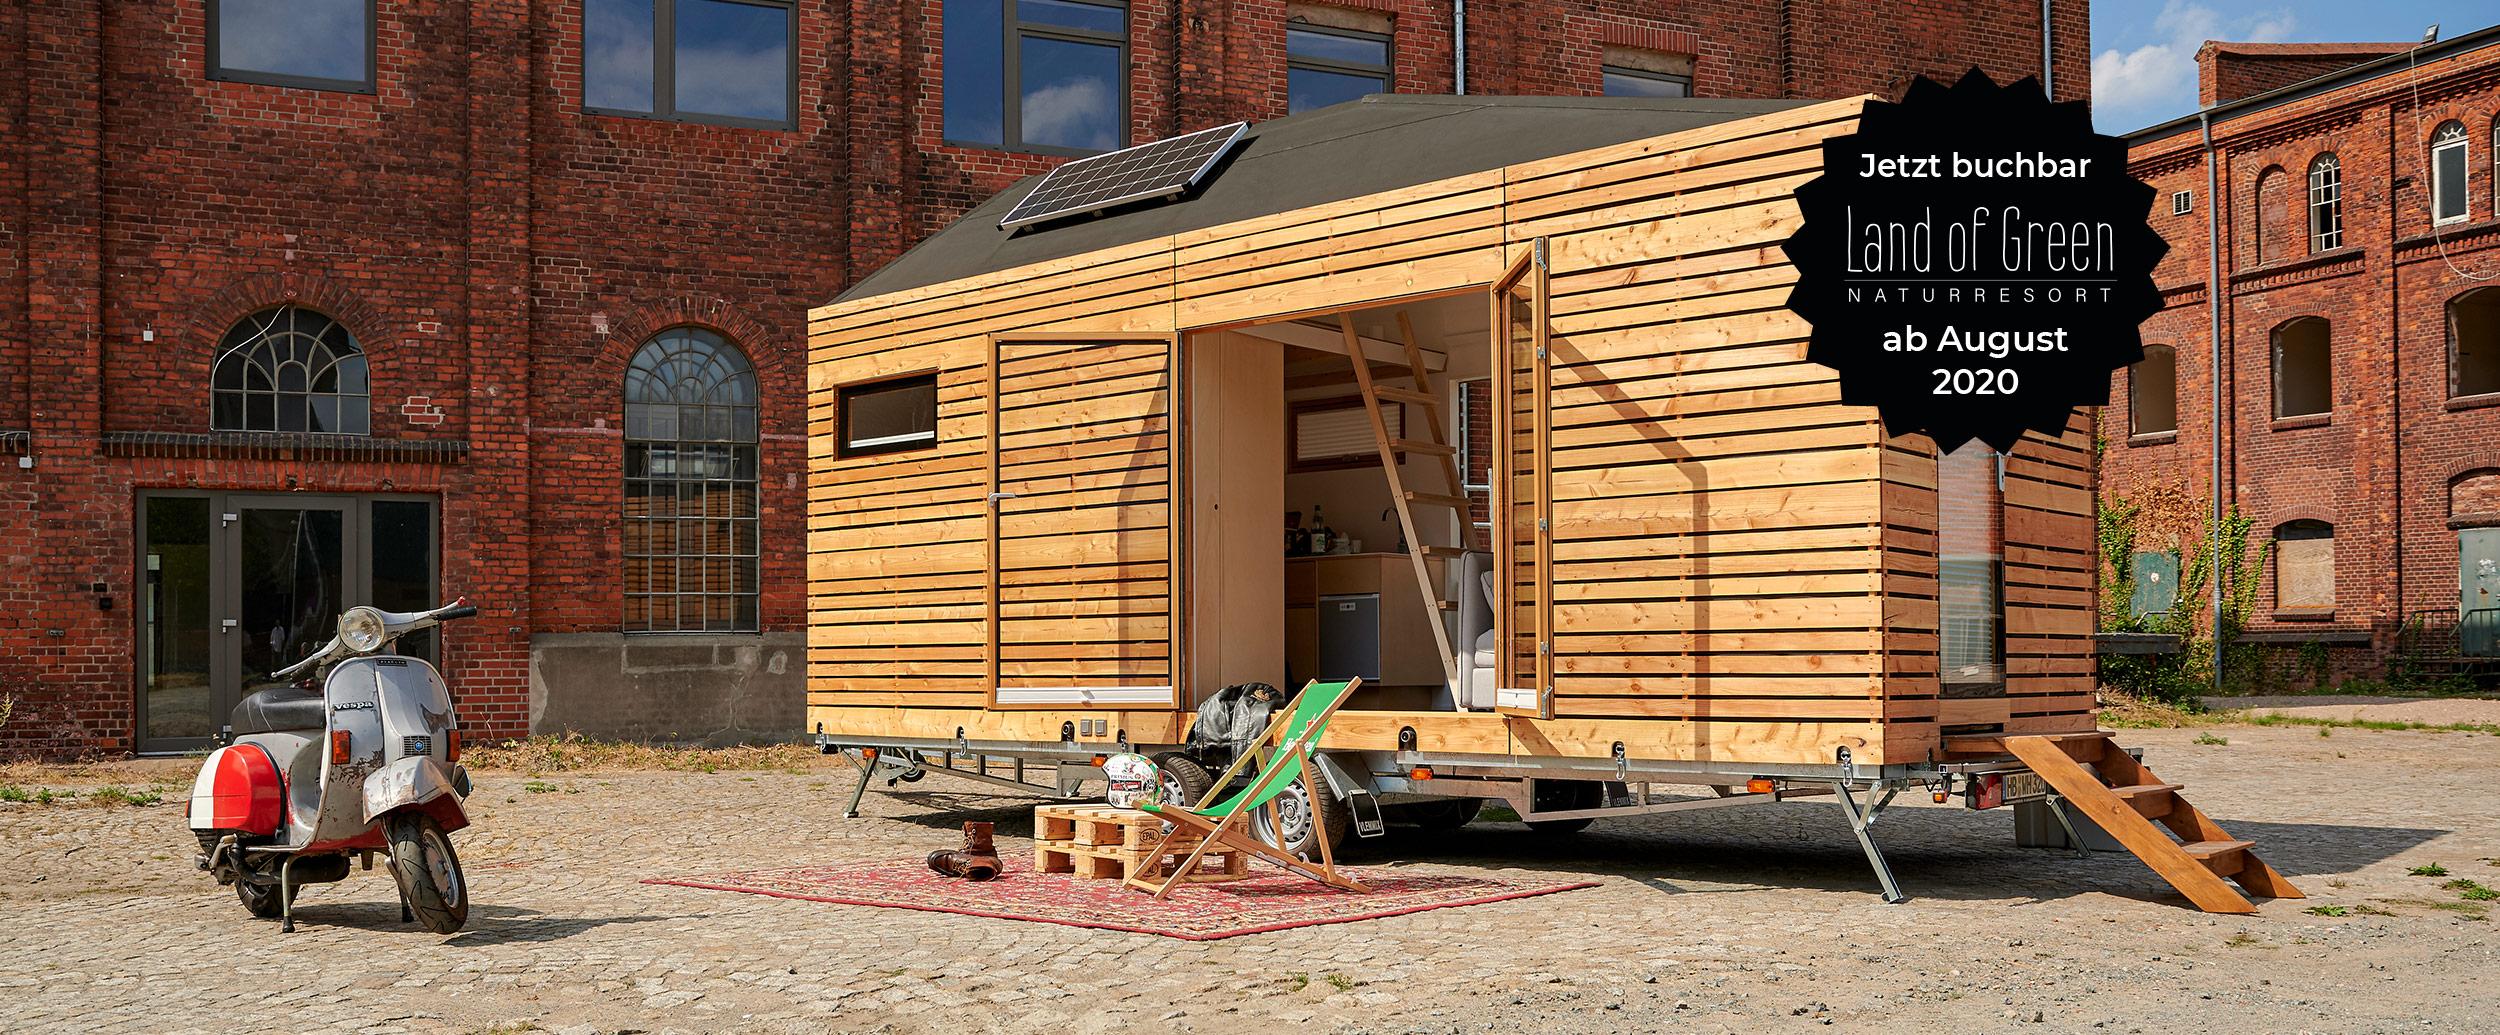 Tinyhouse in Urbaner Umgebung mit Campingstuhl und Roller